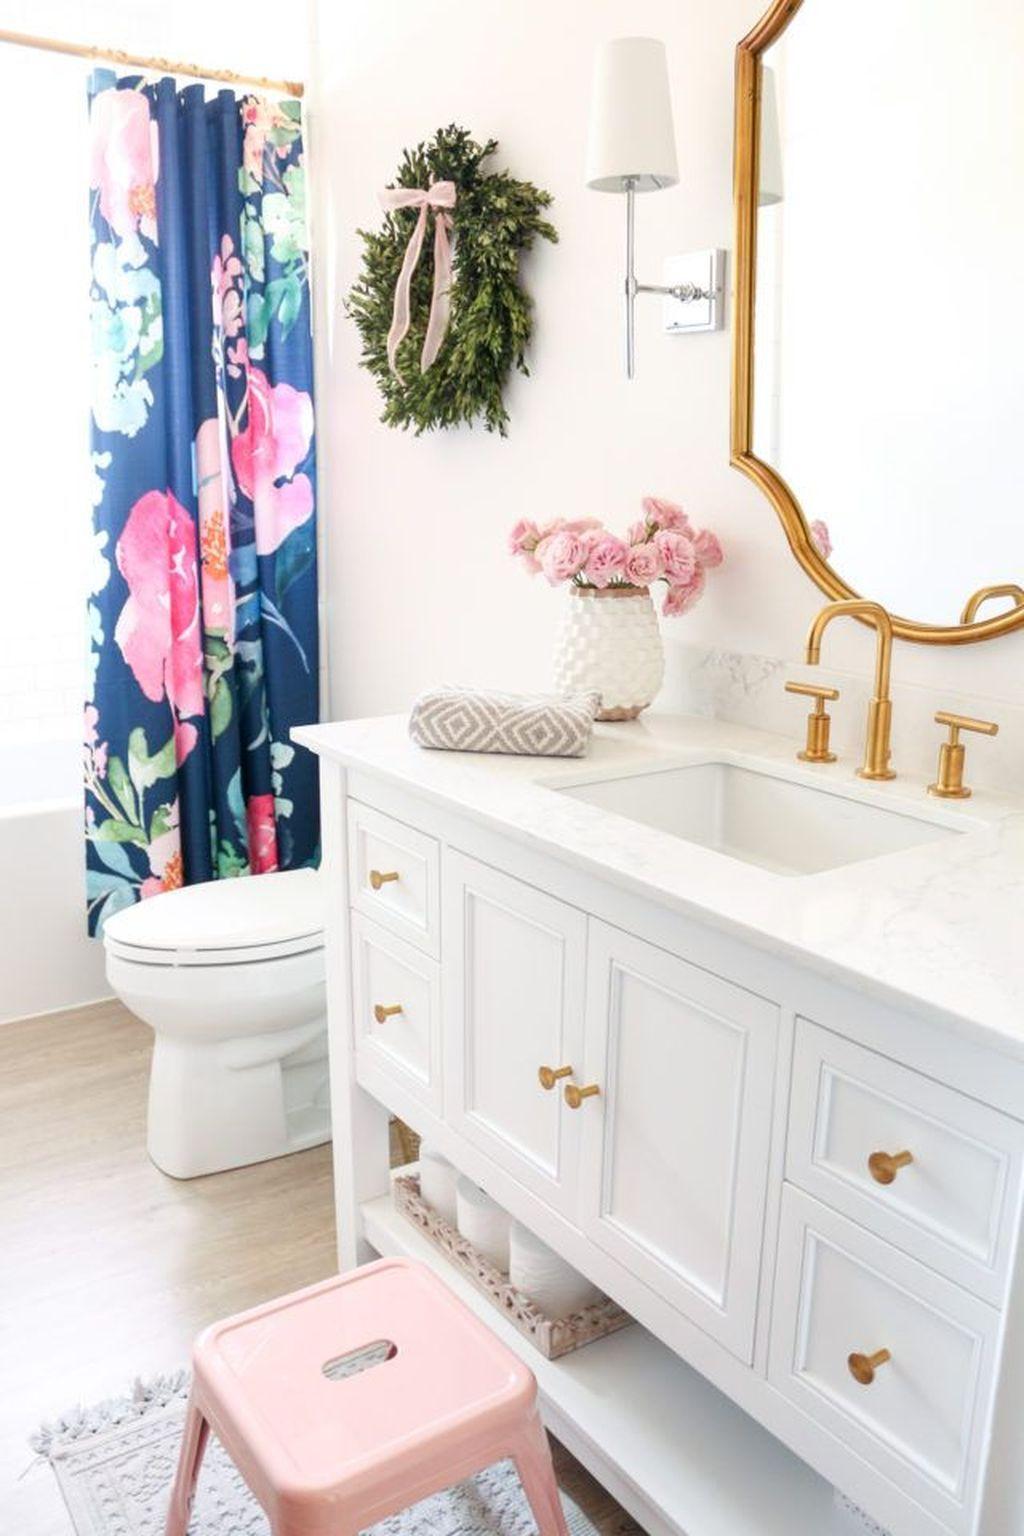 20+ Attractive Bathroom Accessories Ideas To Complete Your Bathroom #remodelingorroomdesign